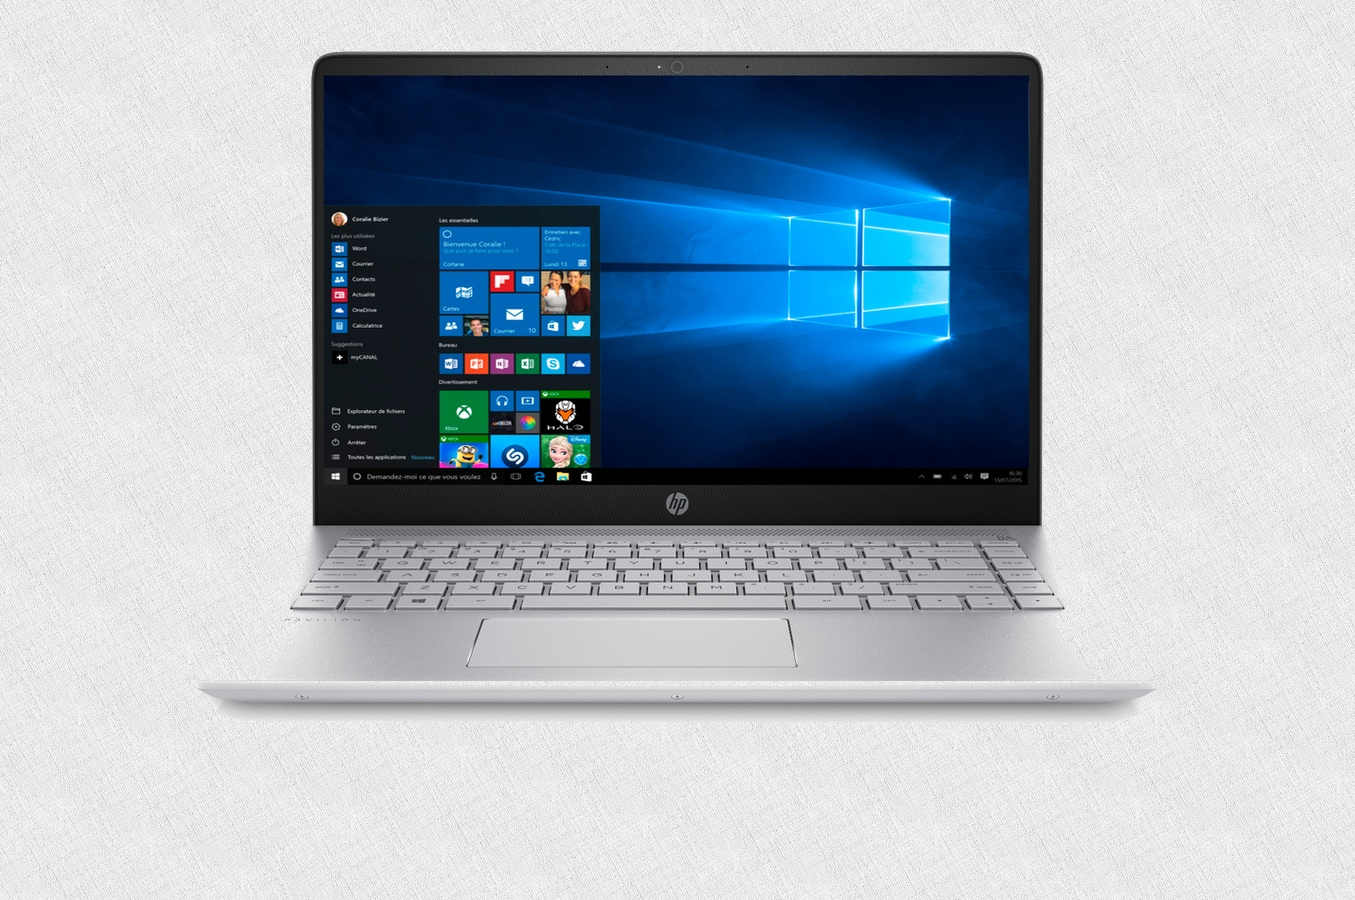 HP PAVILION 14-bk000 - - мультимедийная модель 2018 года